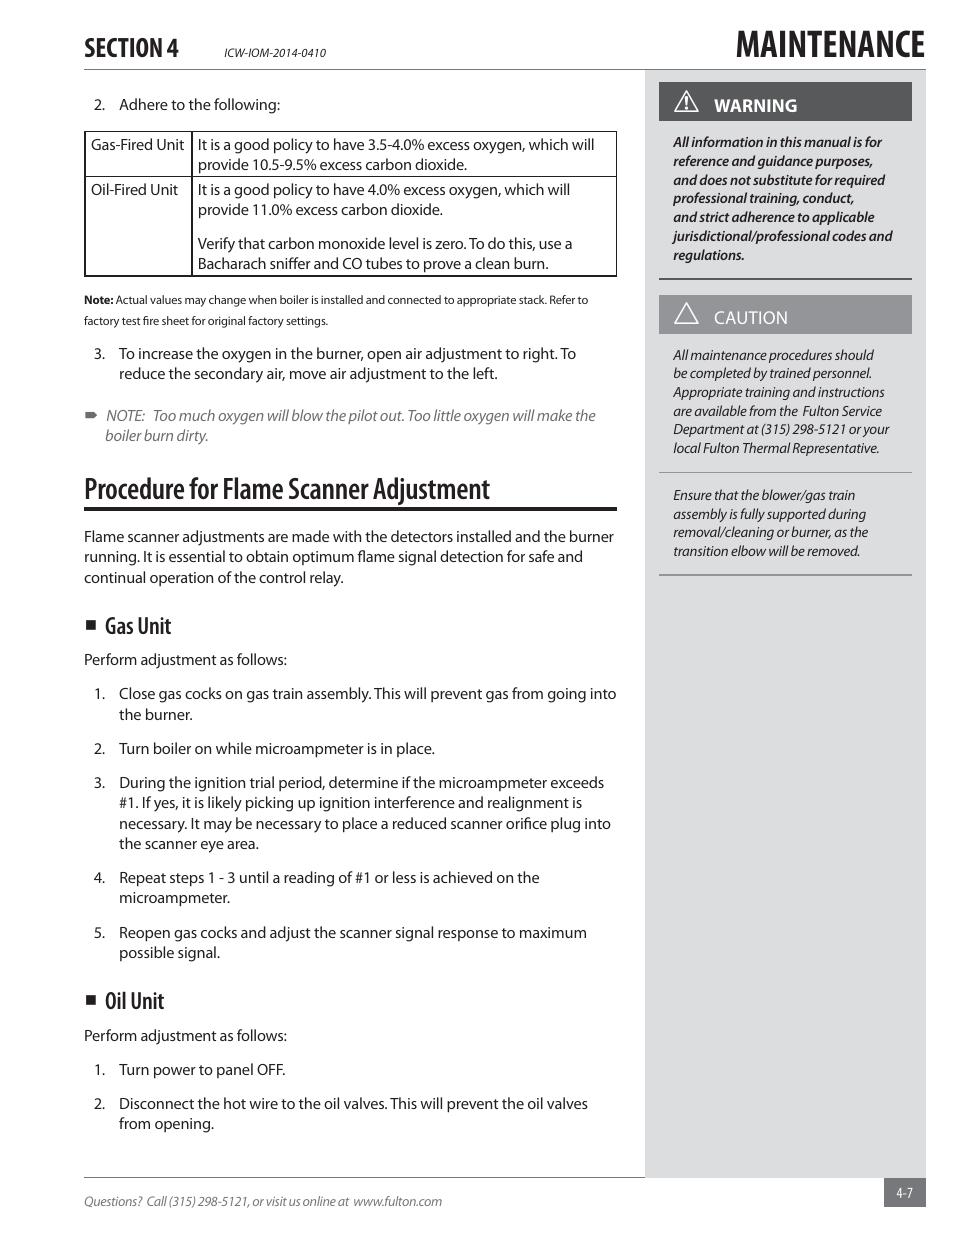 Maintenance, Procedure for flame scanner adjustment, Gas